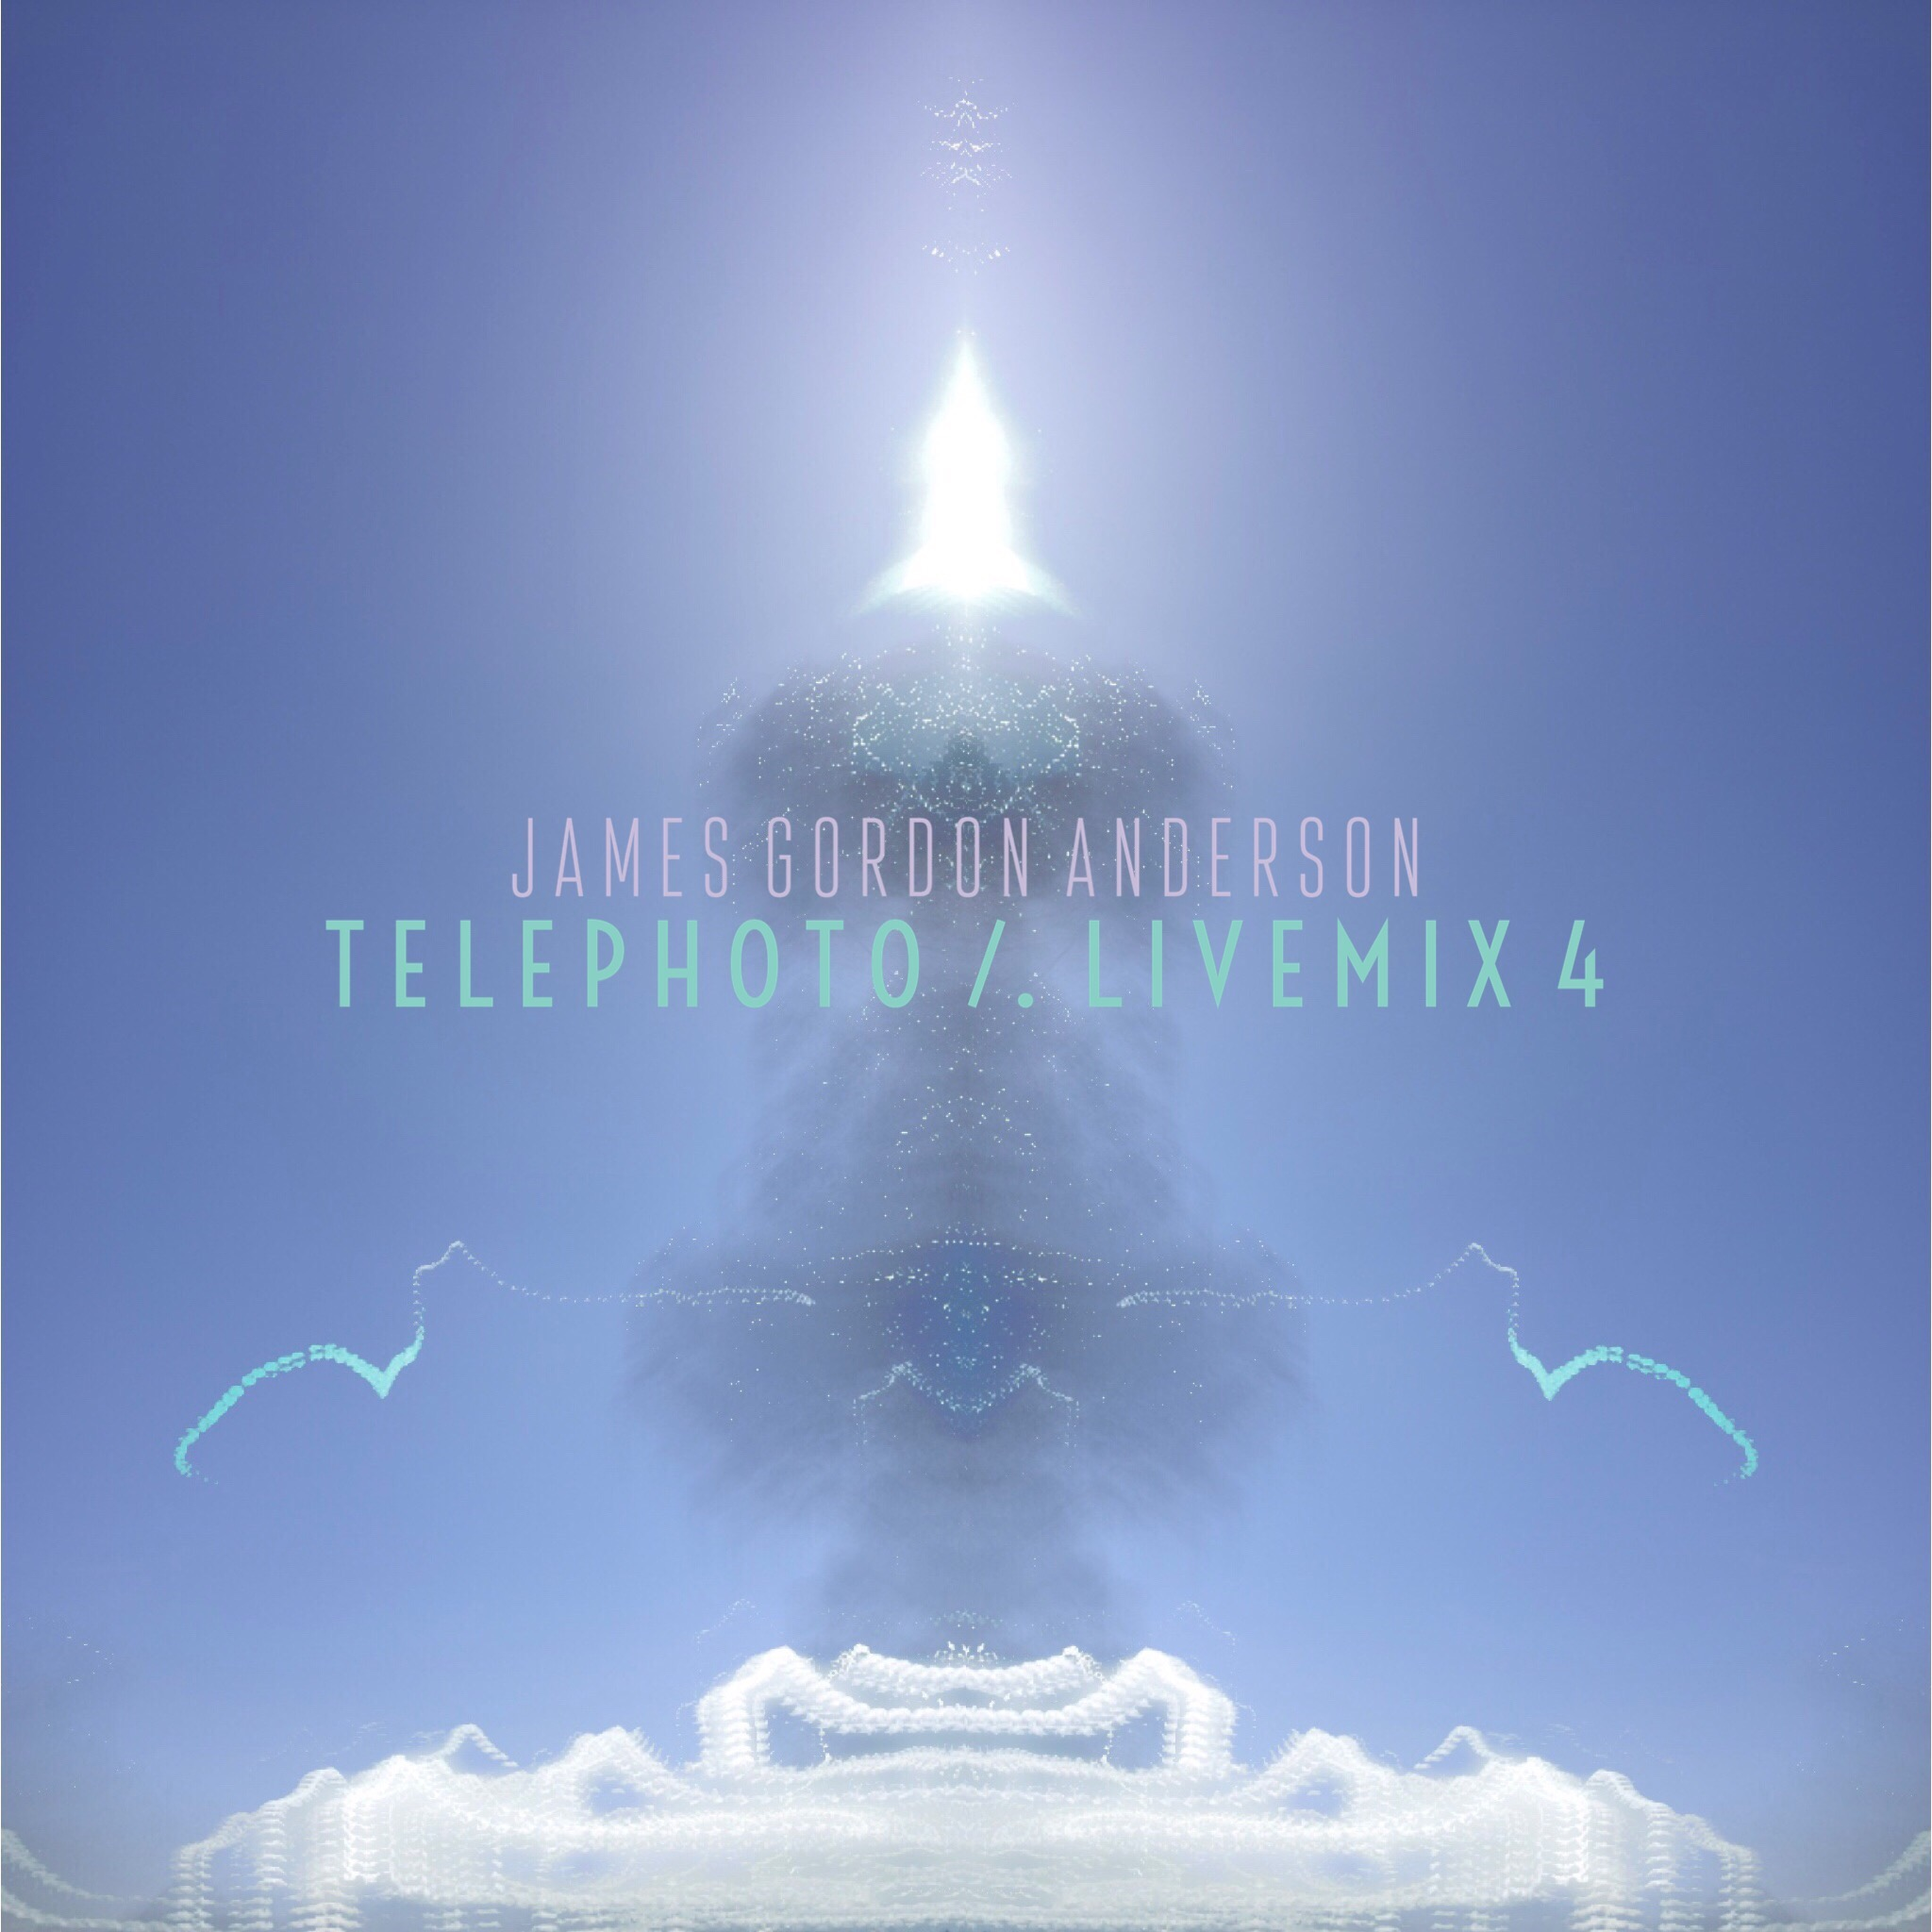 Telephoto / Livemix 4 - HD Videos Bundle 1 with Album Art